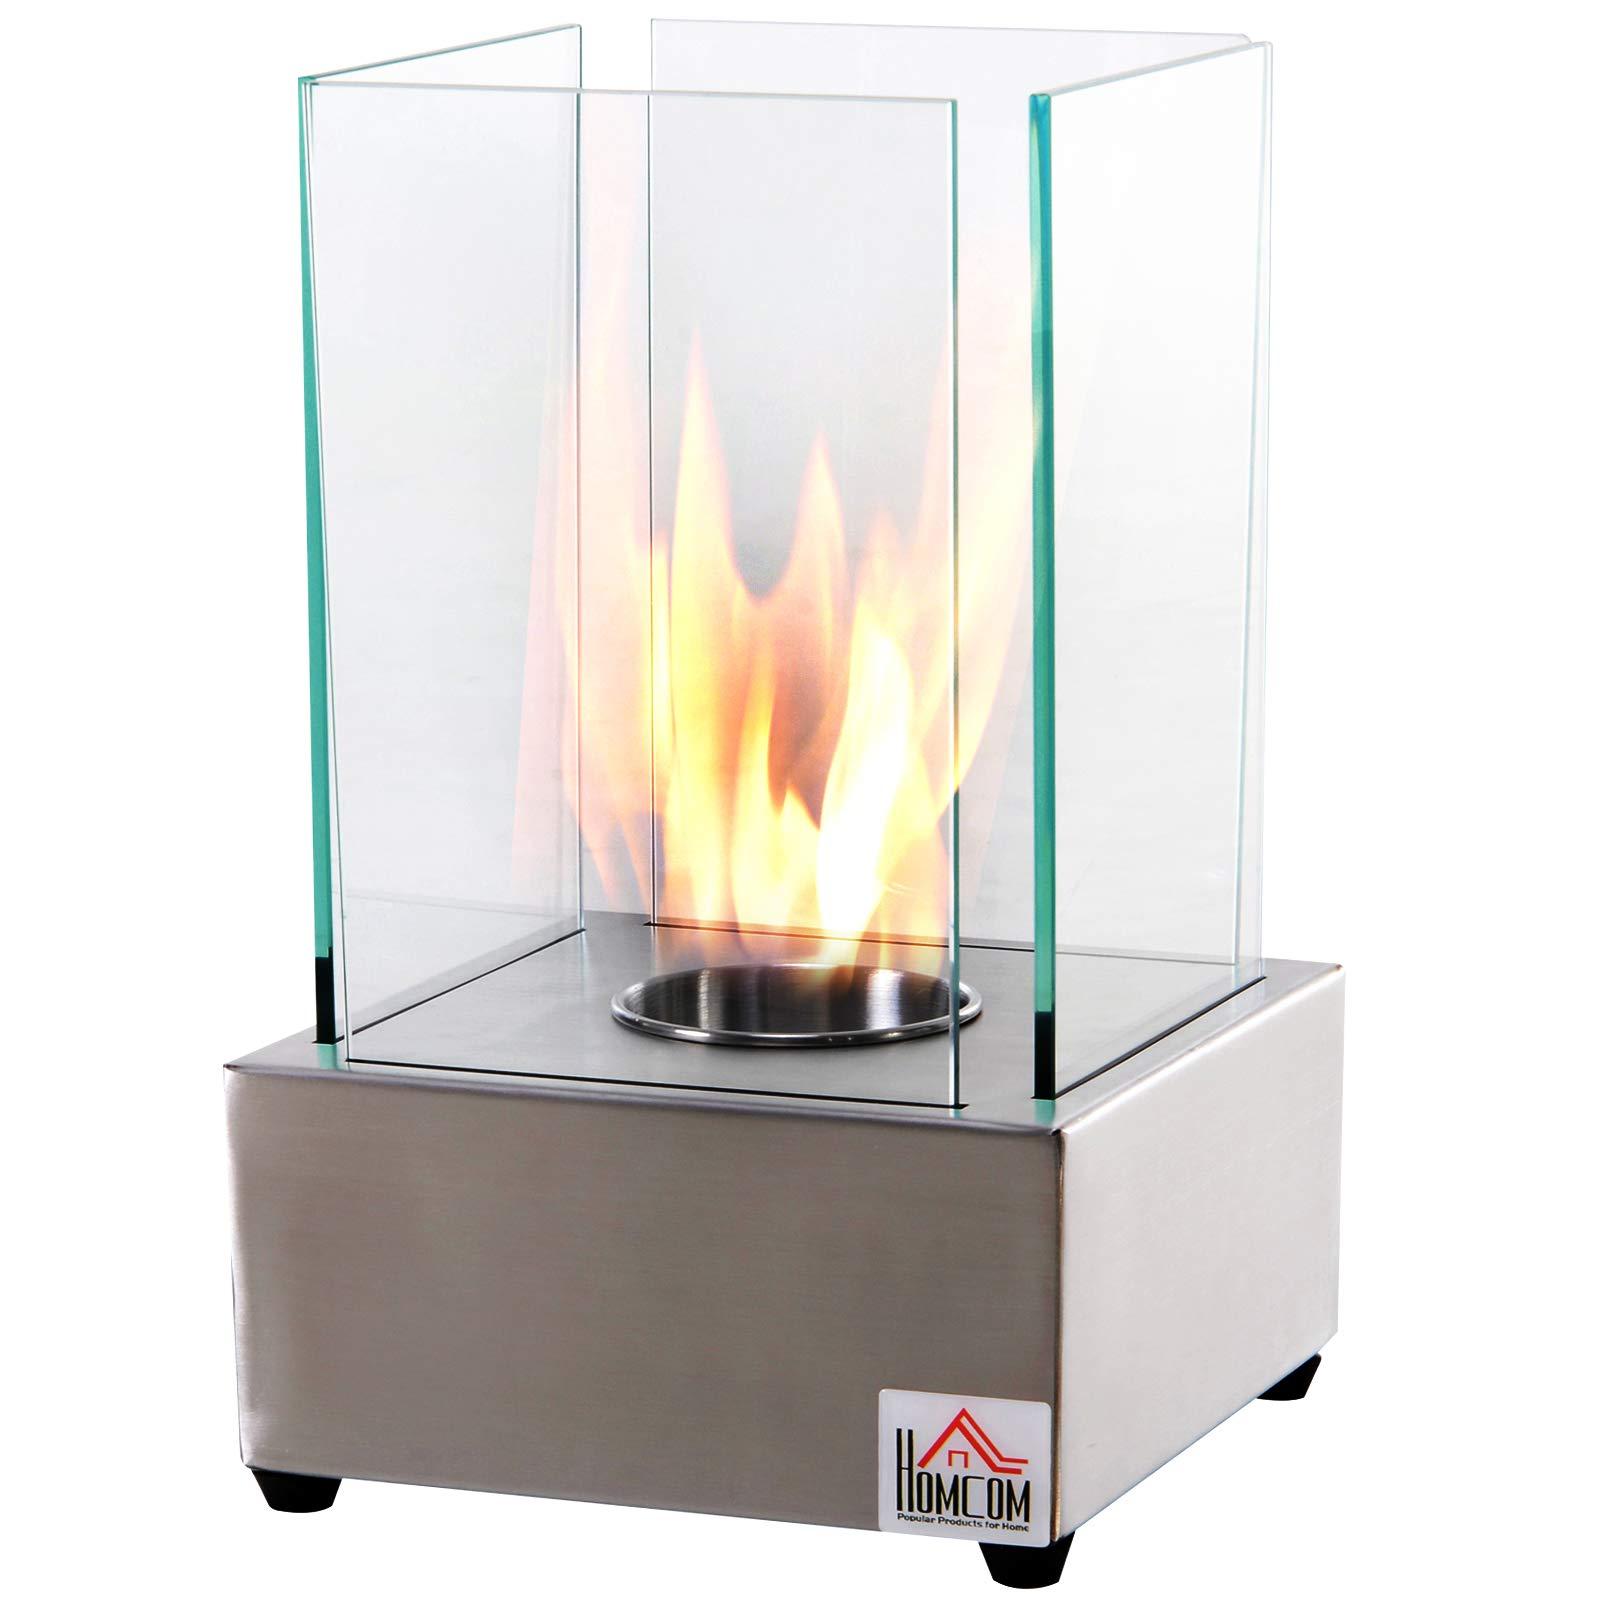 HOMCOM Freestanding Tabletop Ventless Bio Ethanol Fireplace Glass - Stainless Steel by HOMCOM